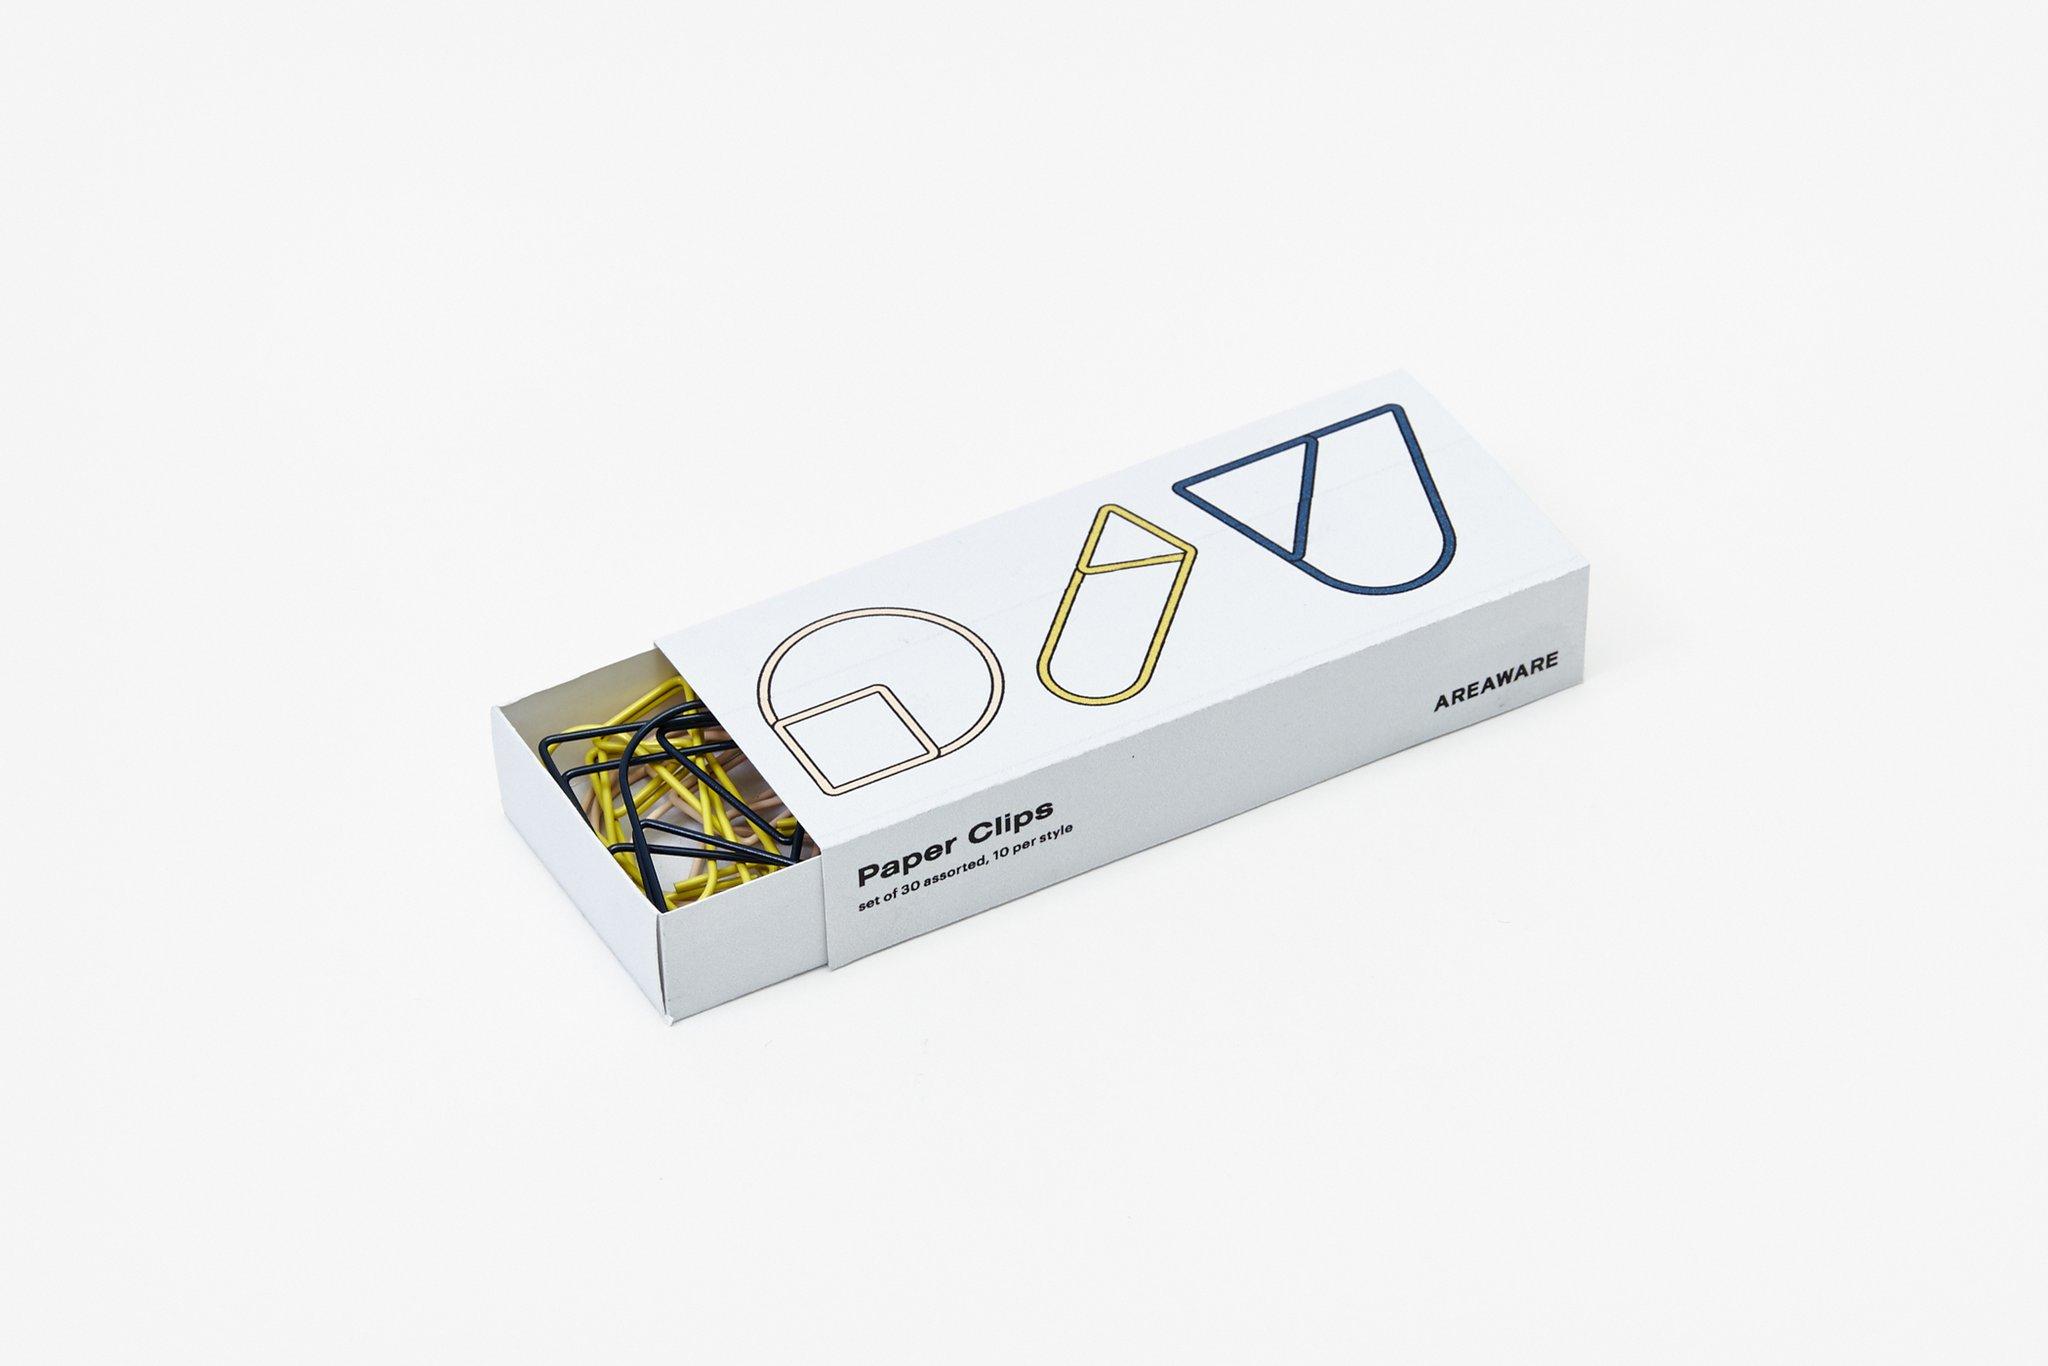 PaperClips-matchbox-silo-13-DLPCMB_2048x2048.jpg